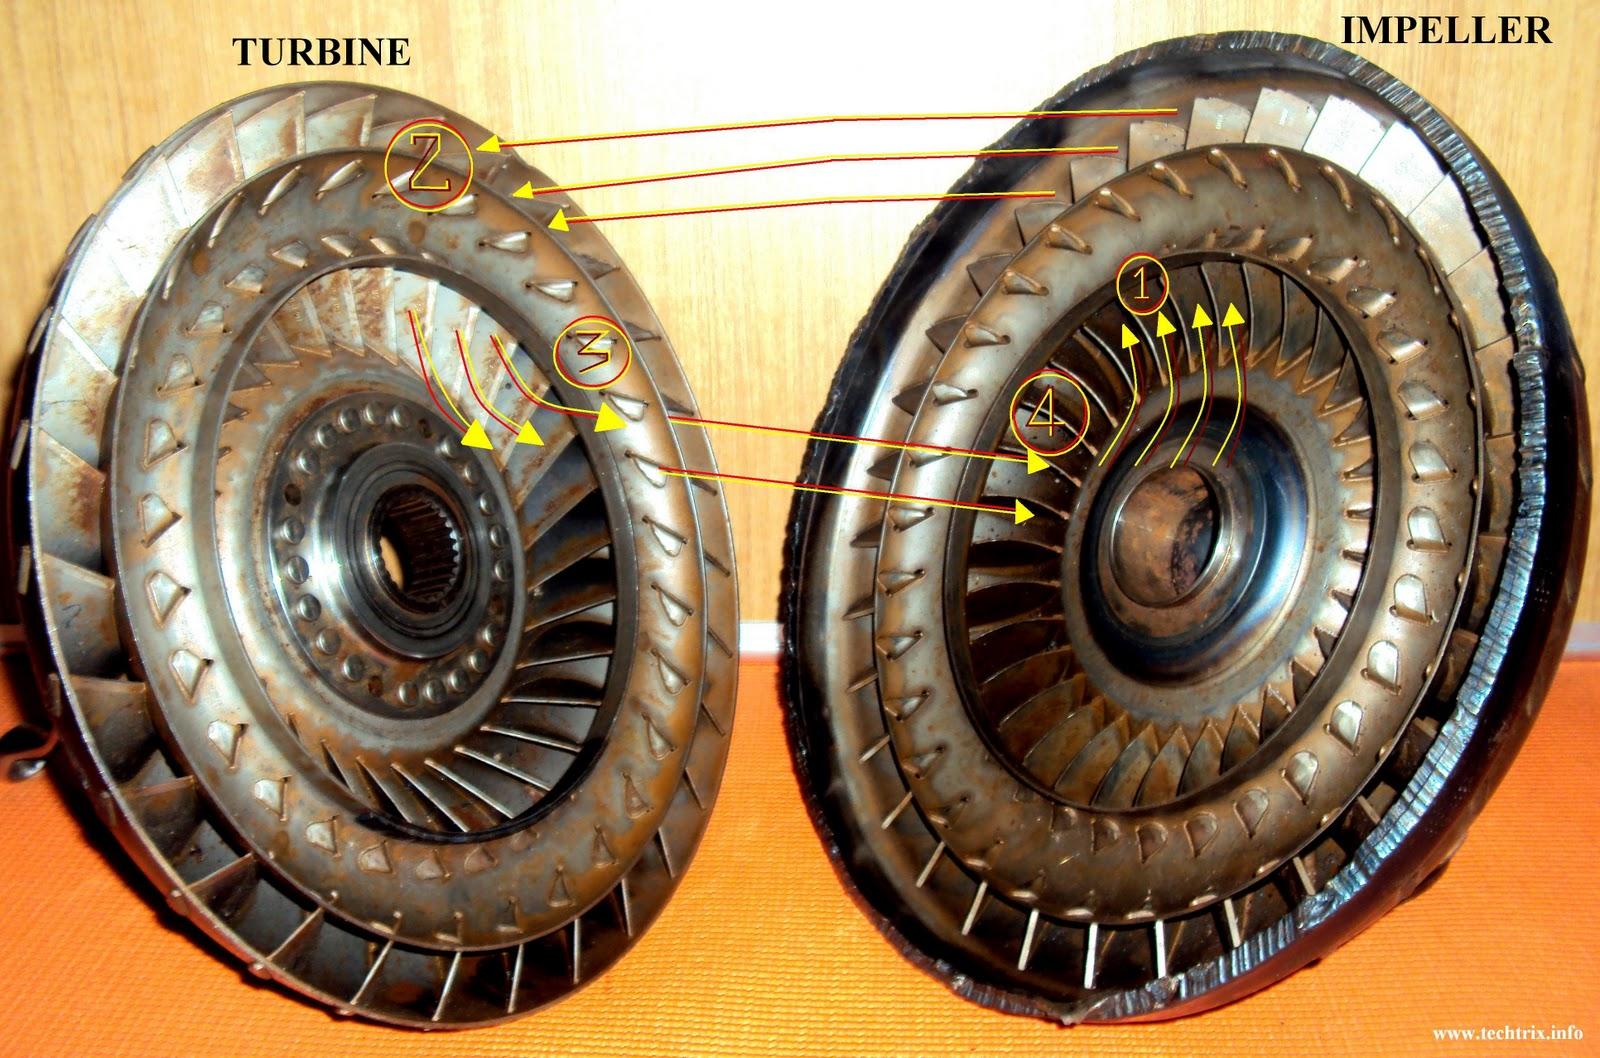 Torque Converter Impeller : Automotiveeng projects